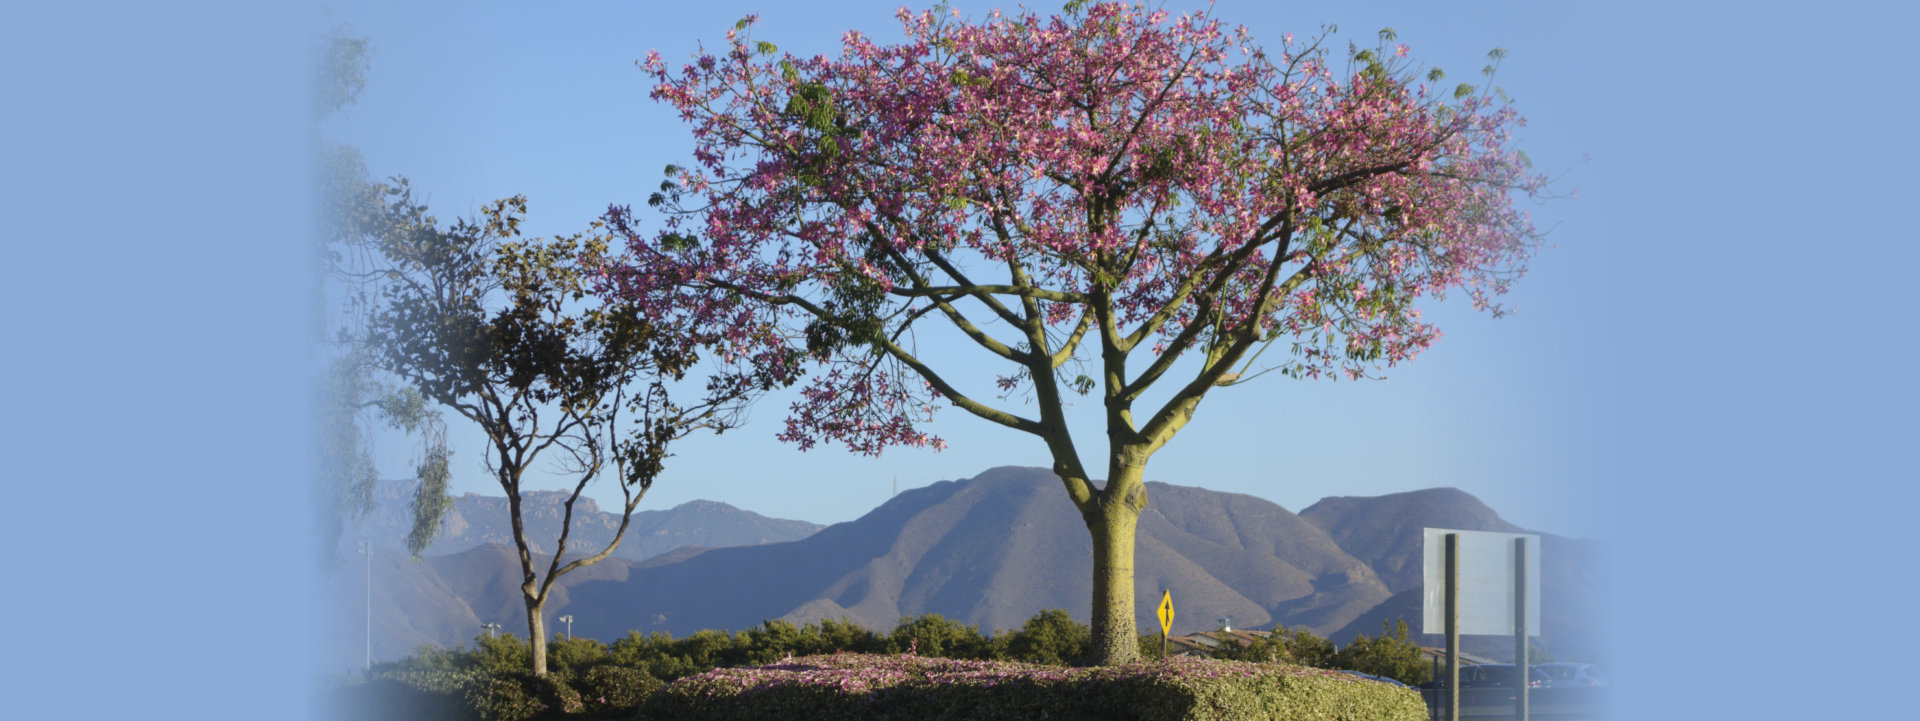 ceiba speciosa or floss silk tree